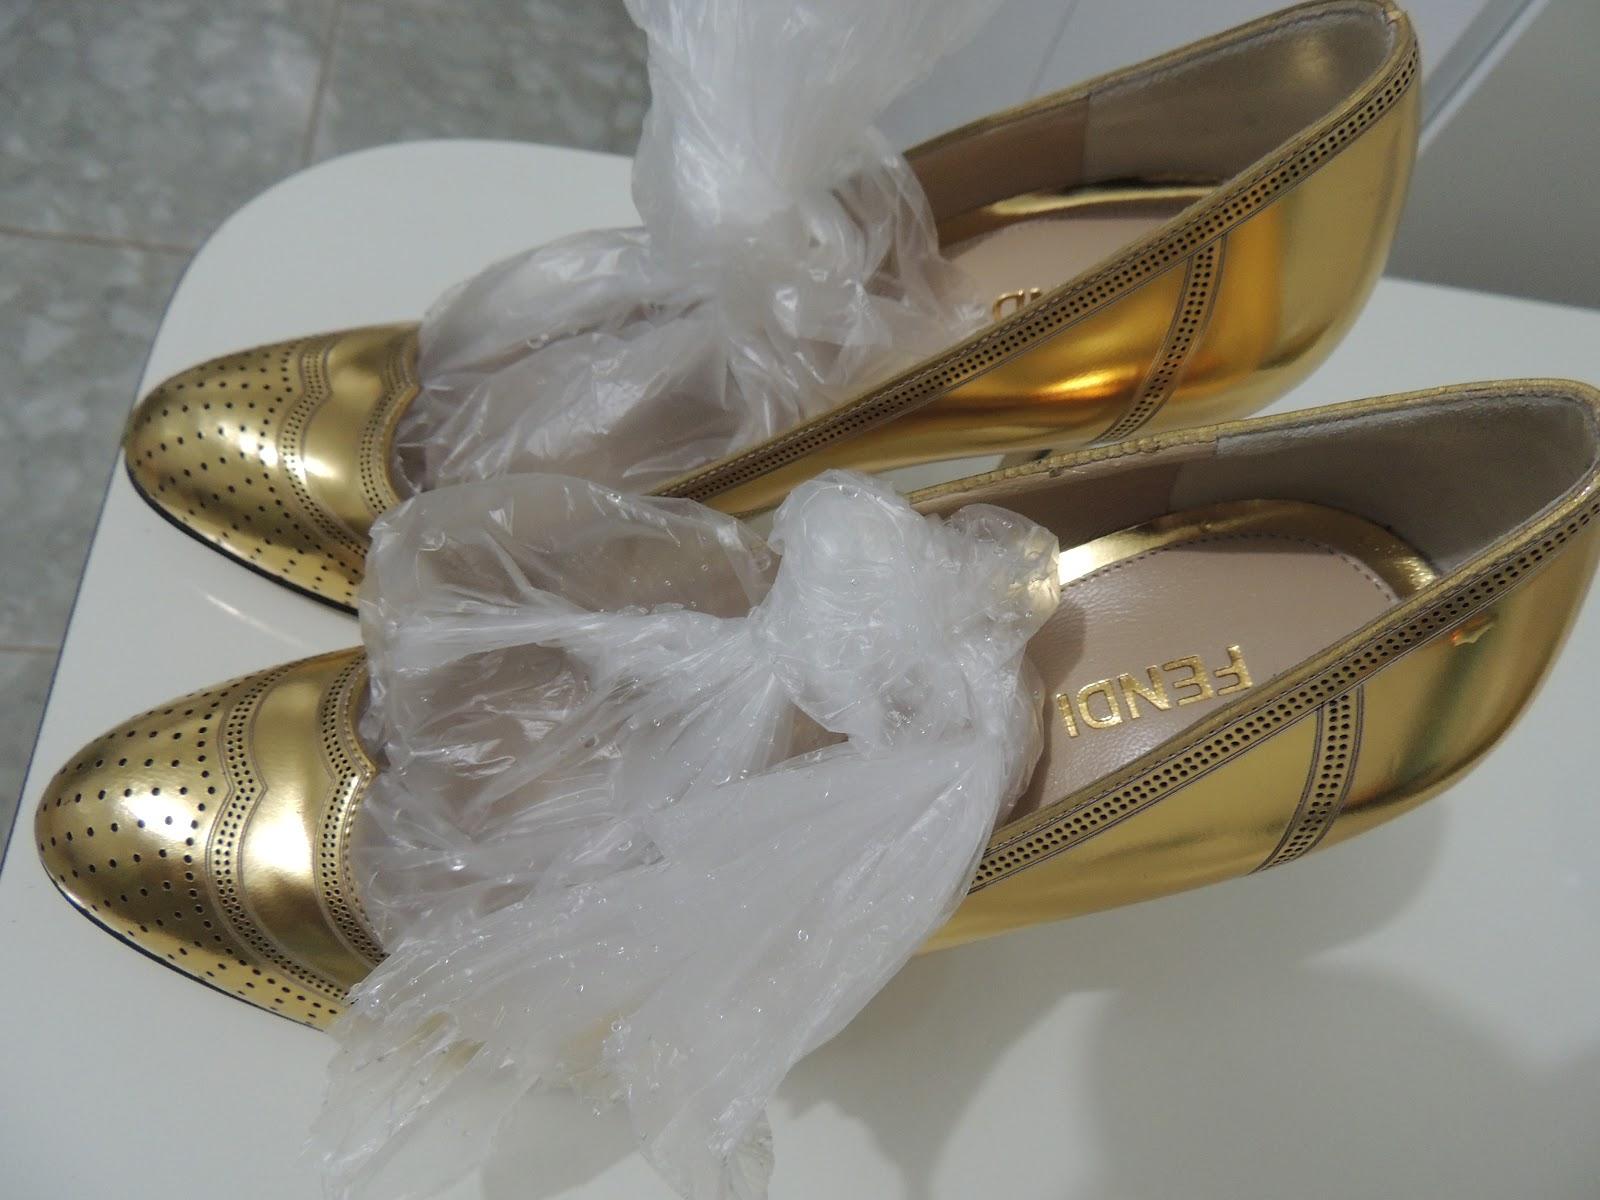 como folgar sapatos